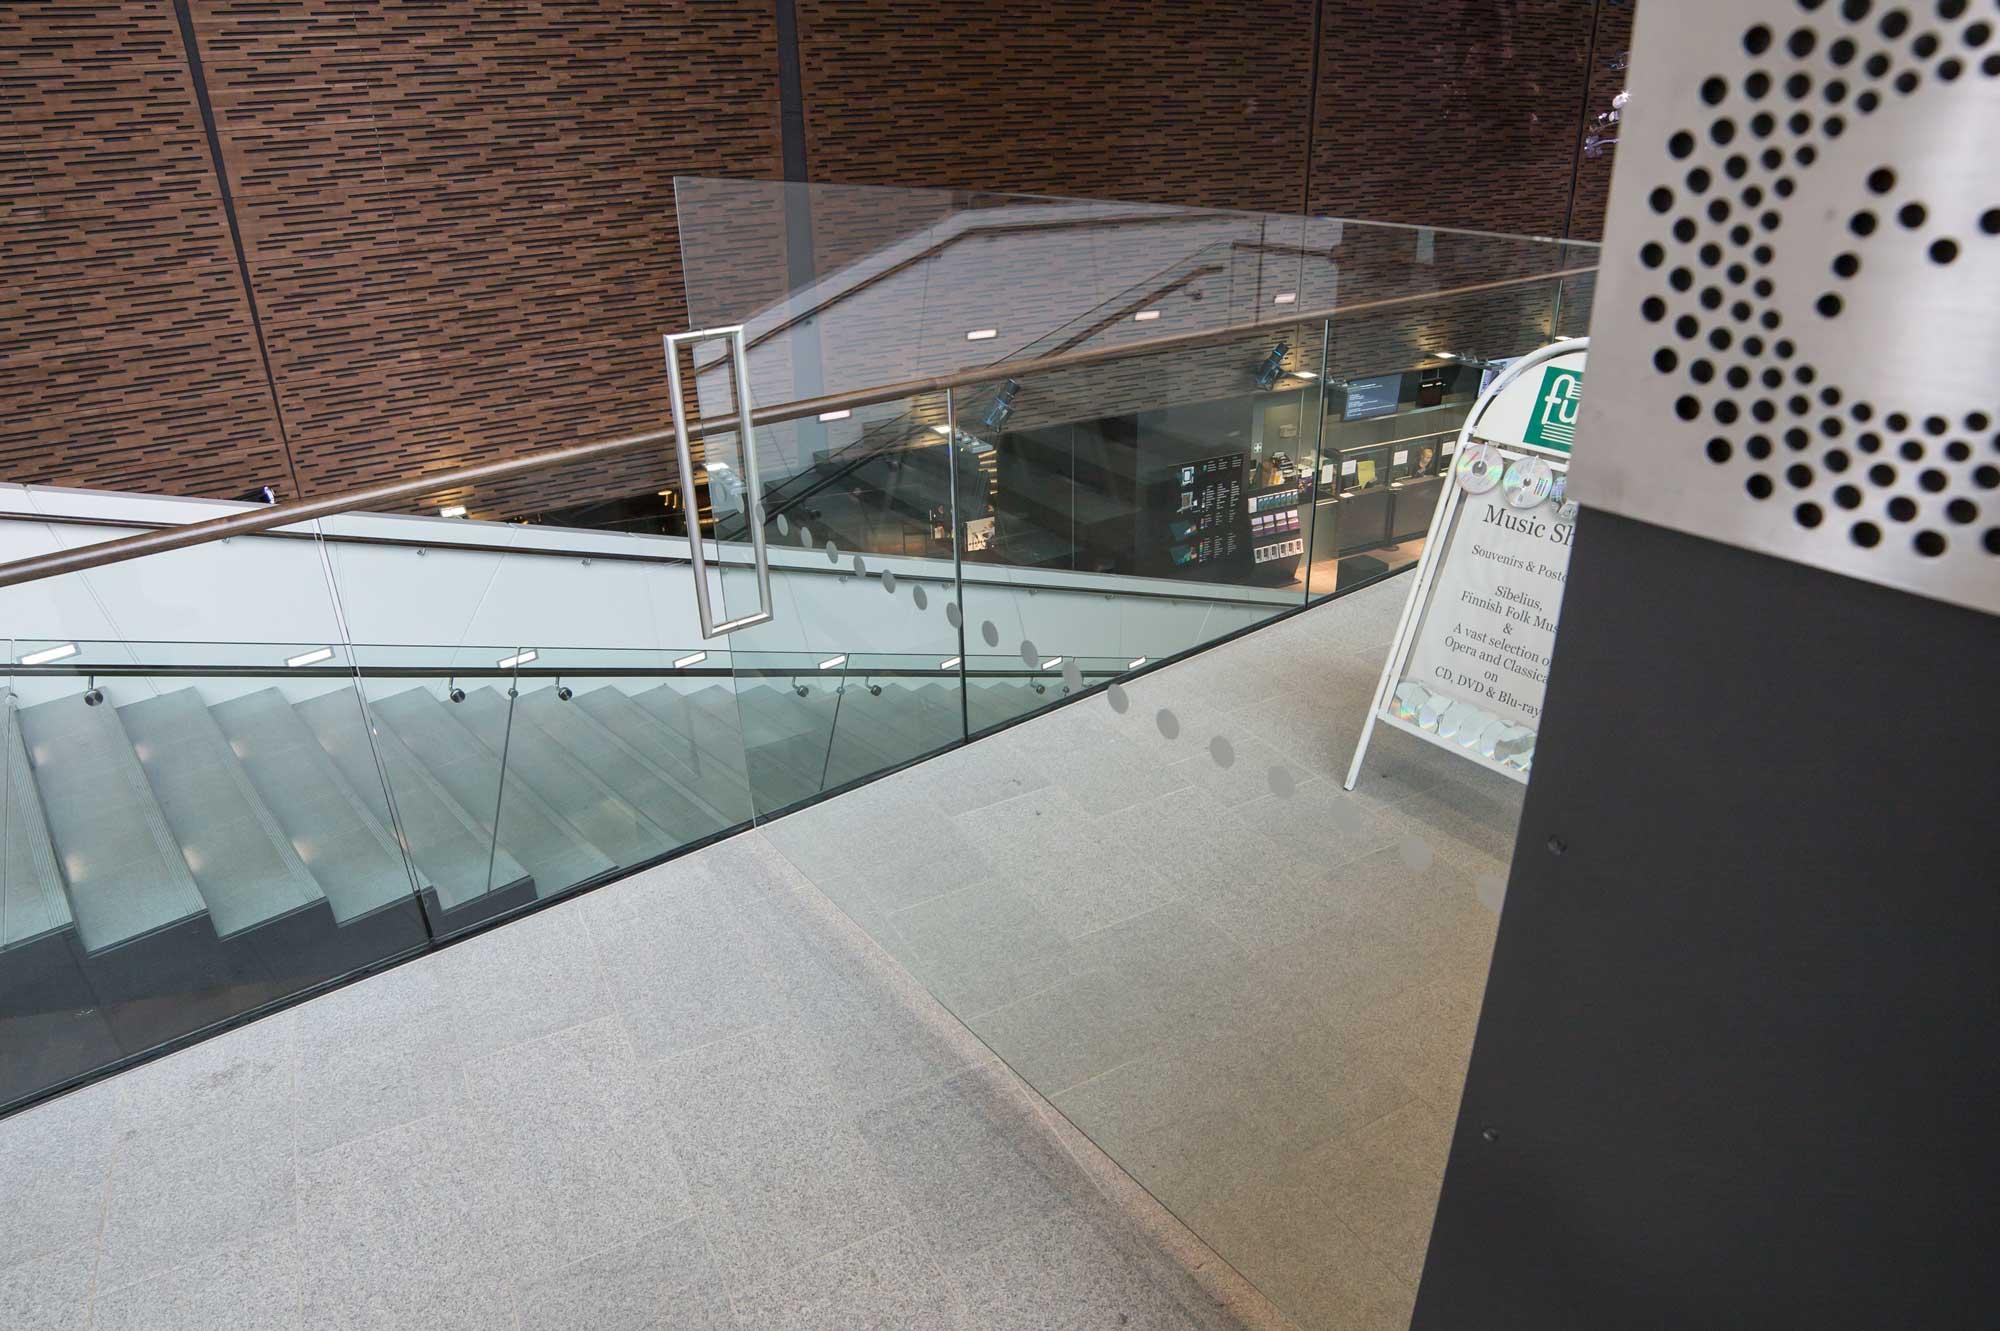 Scanmikael_Sliding glass doors_Fuga at Helsinki Music Centre, Finland